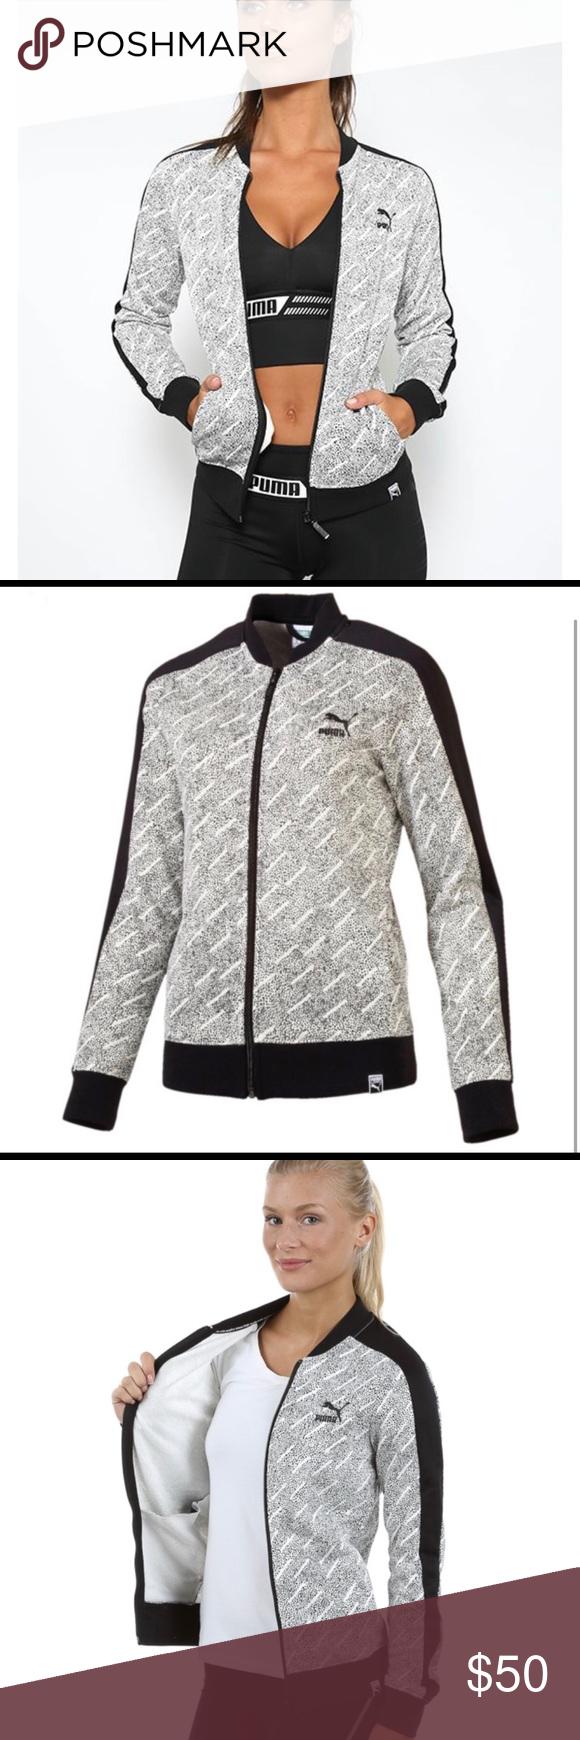 6c5eefb51617 NWT Puma Classic T7 AOP Black White Track Jacket Puma AOP T7 Track Jacket  Classic fit